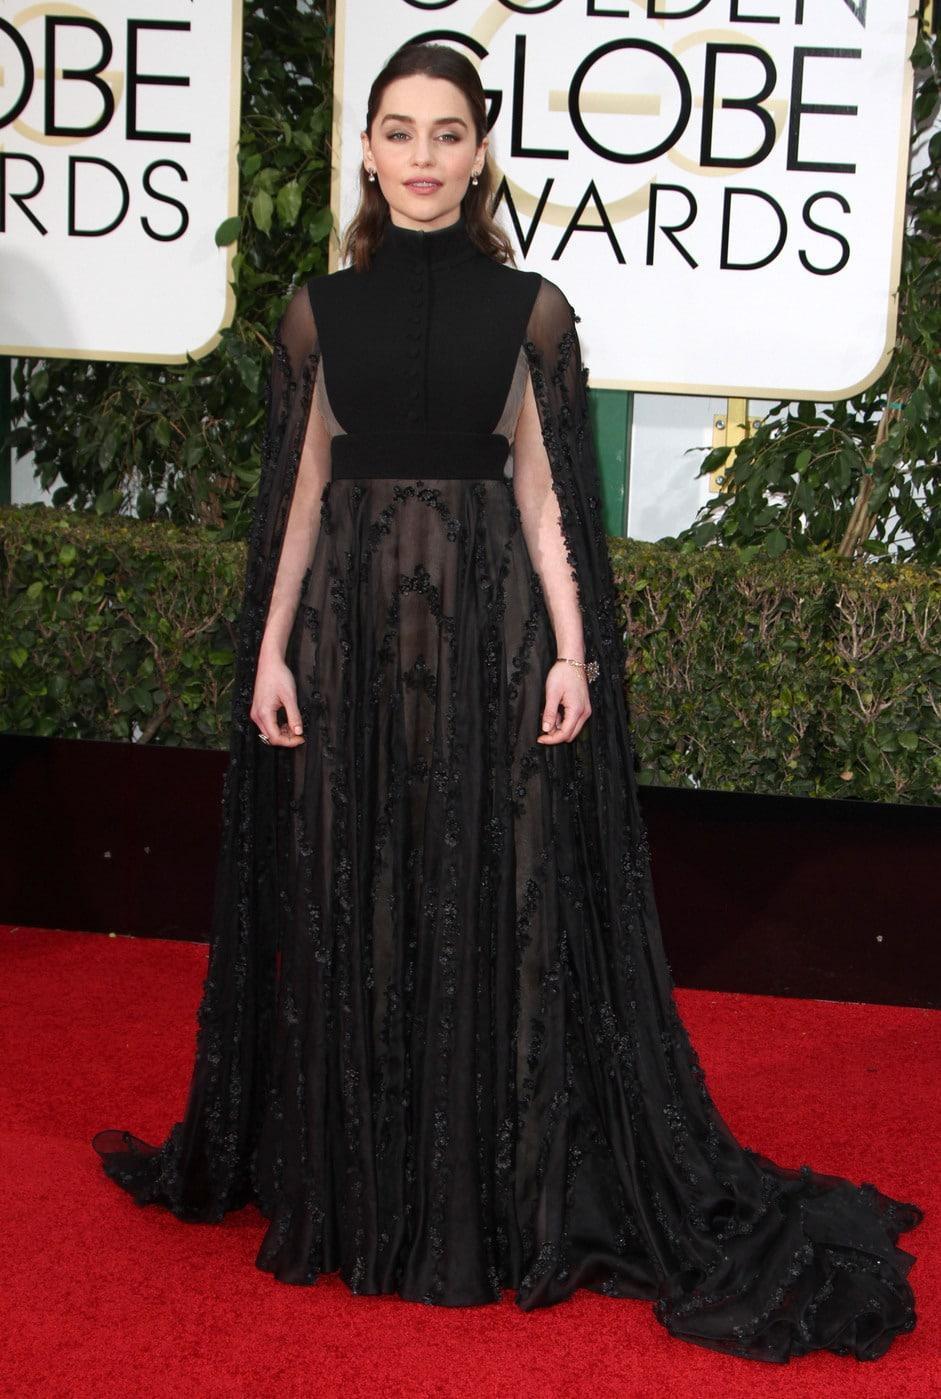 Emilia Clarke at the 2016 Golden Globes